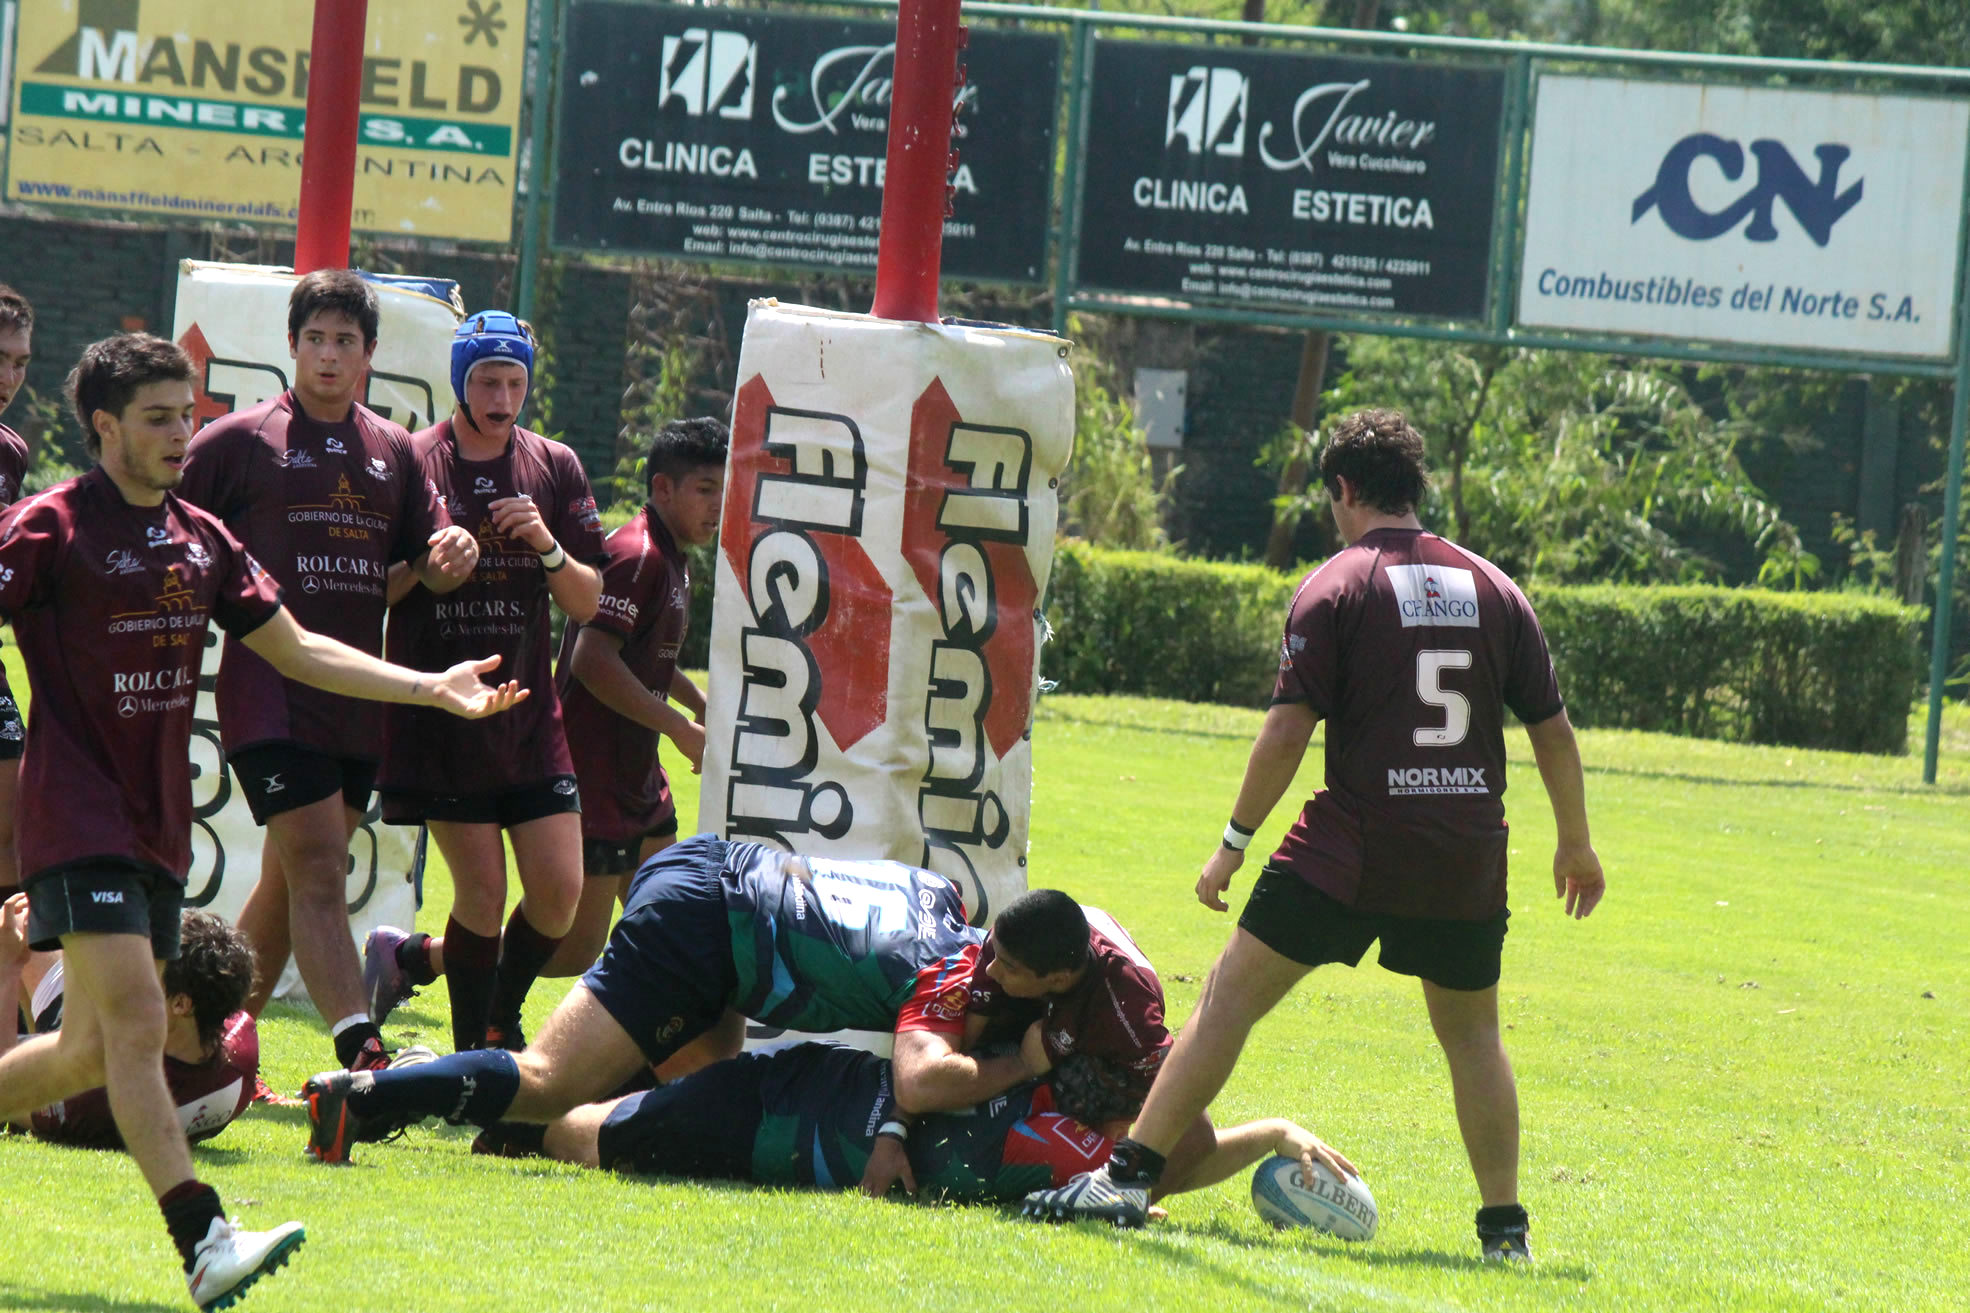 Eliseo Marchetti anota un try ante Salta. (Foto: Prensa URMDP)